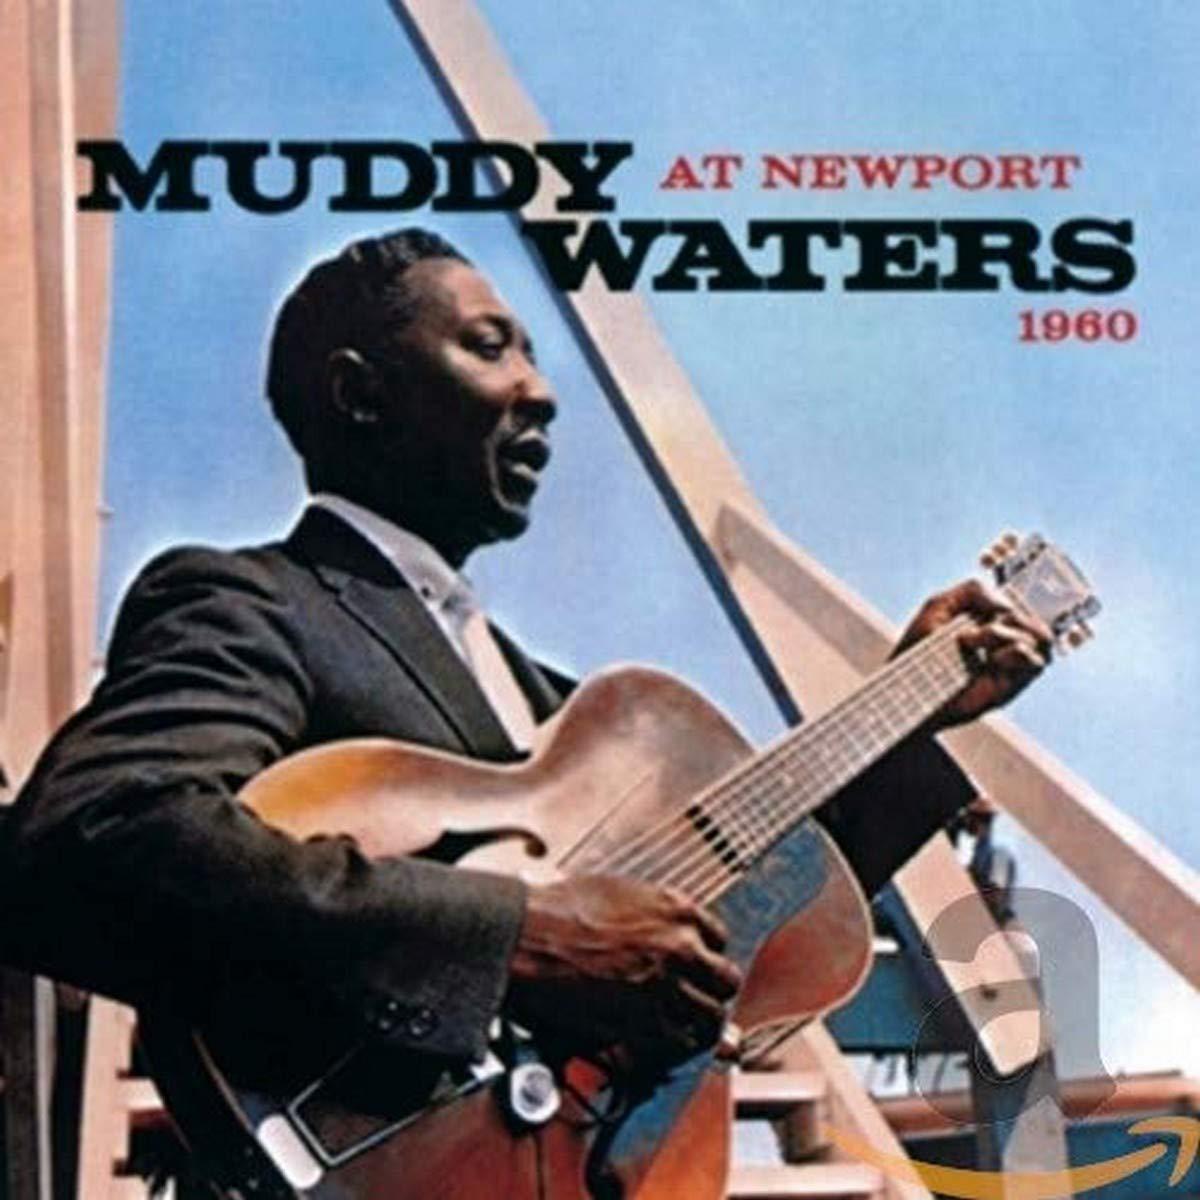 Muddy Waters - At Newport 1960 (2017) [FLAC] Download